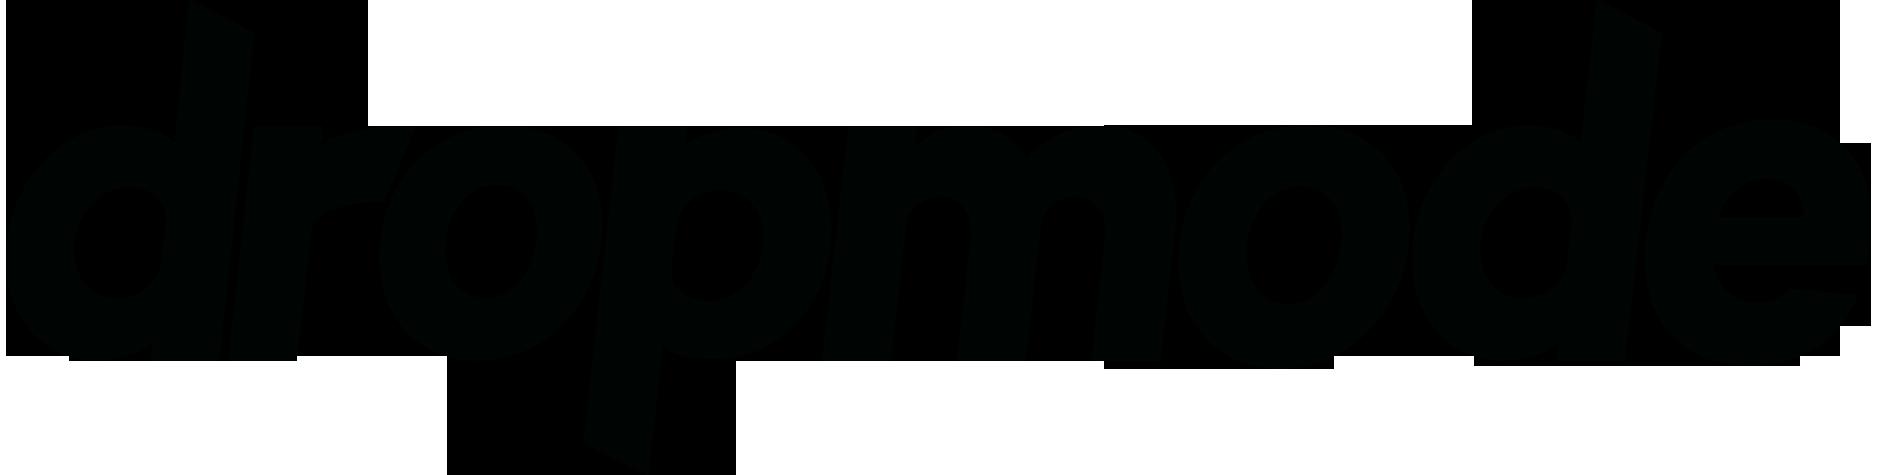 Dropmode logo